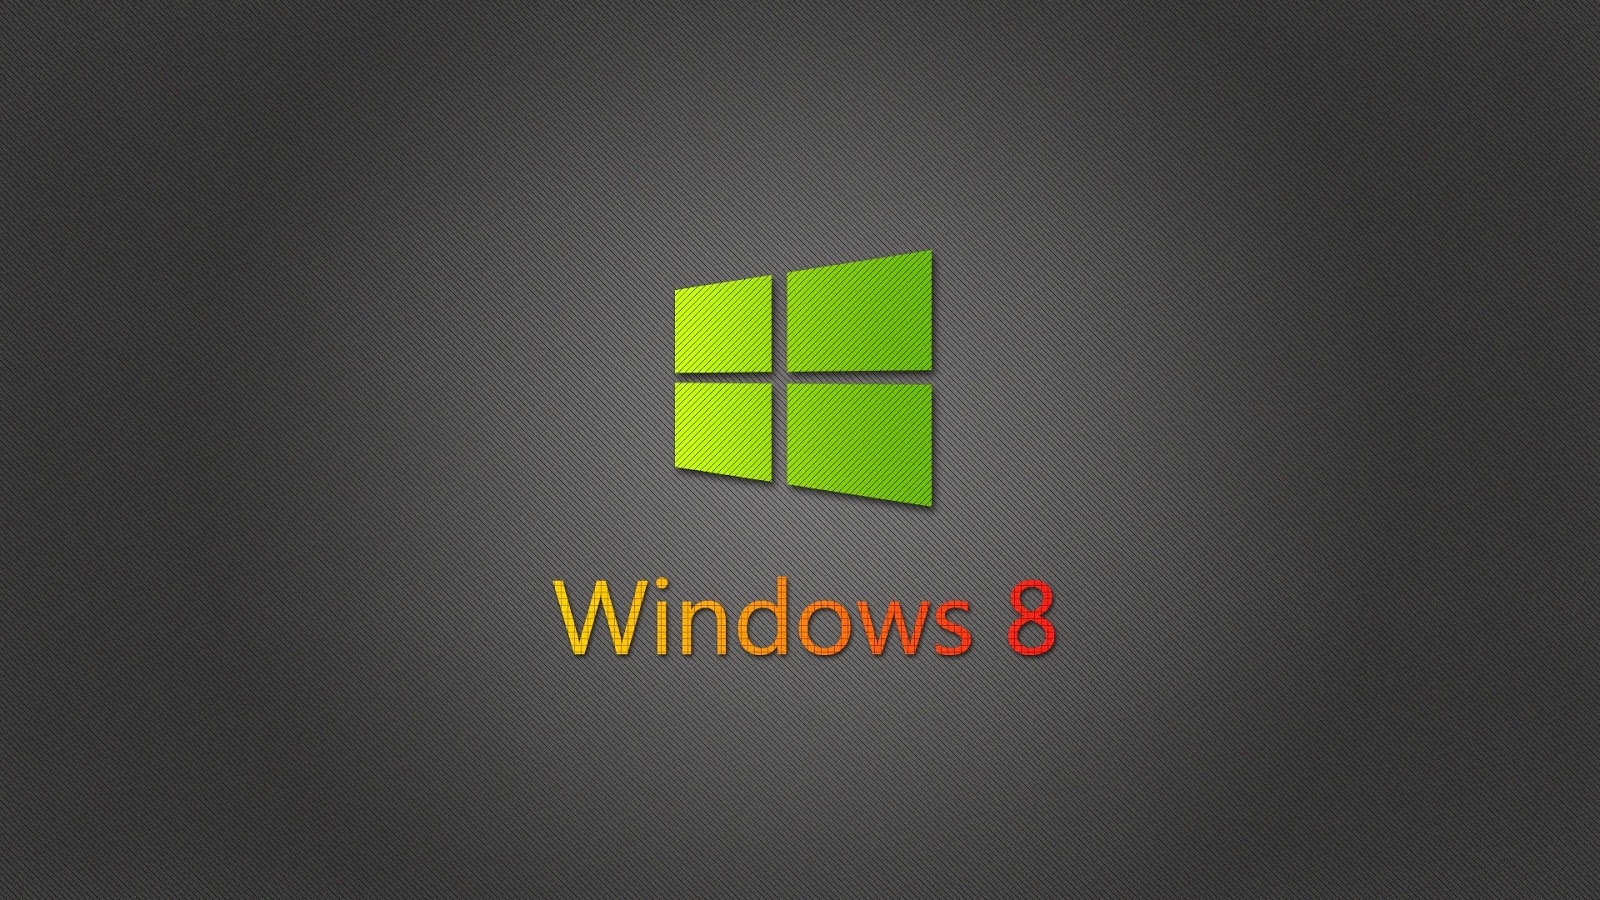 windows-8-metro-theme-dark-grey-background-freen-logo-text-wallpaper.jpg